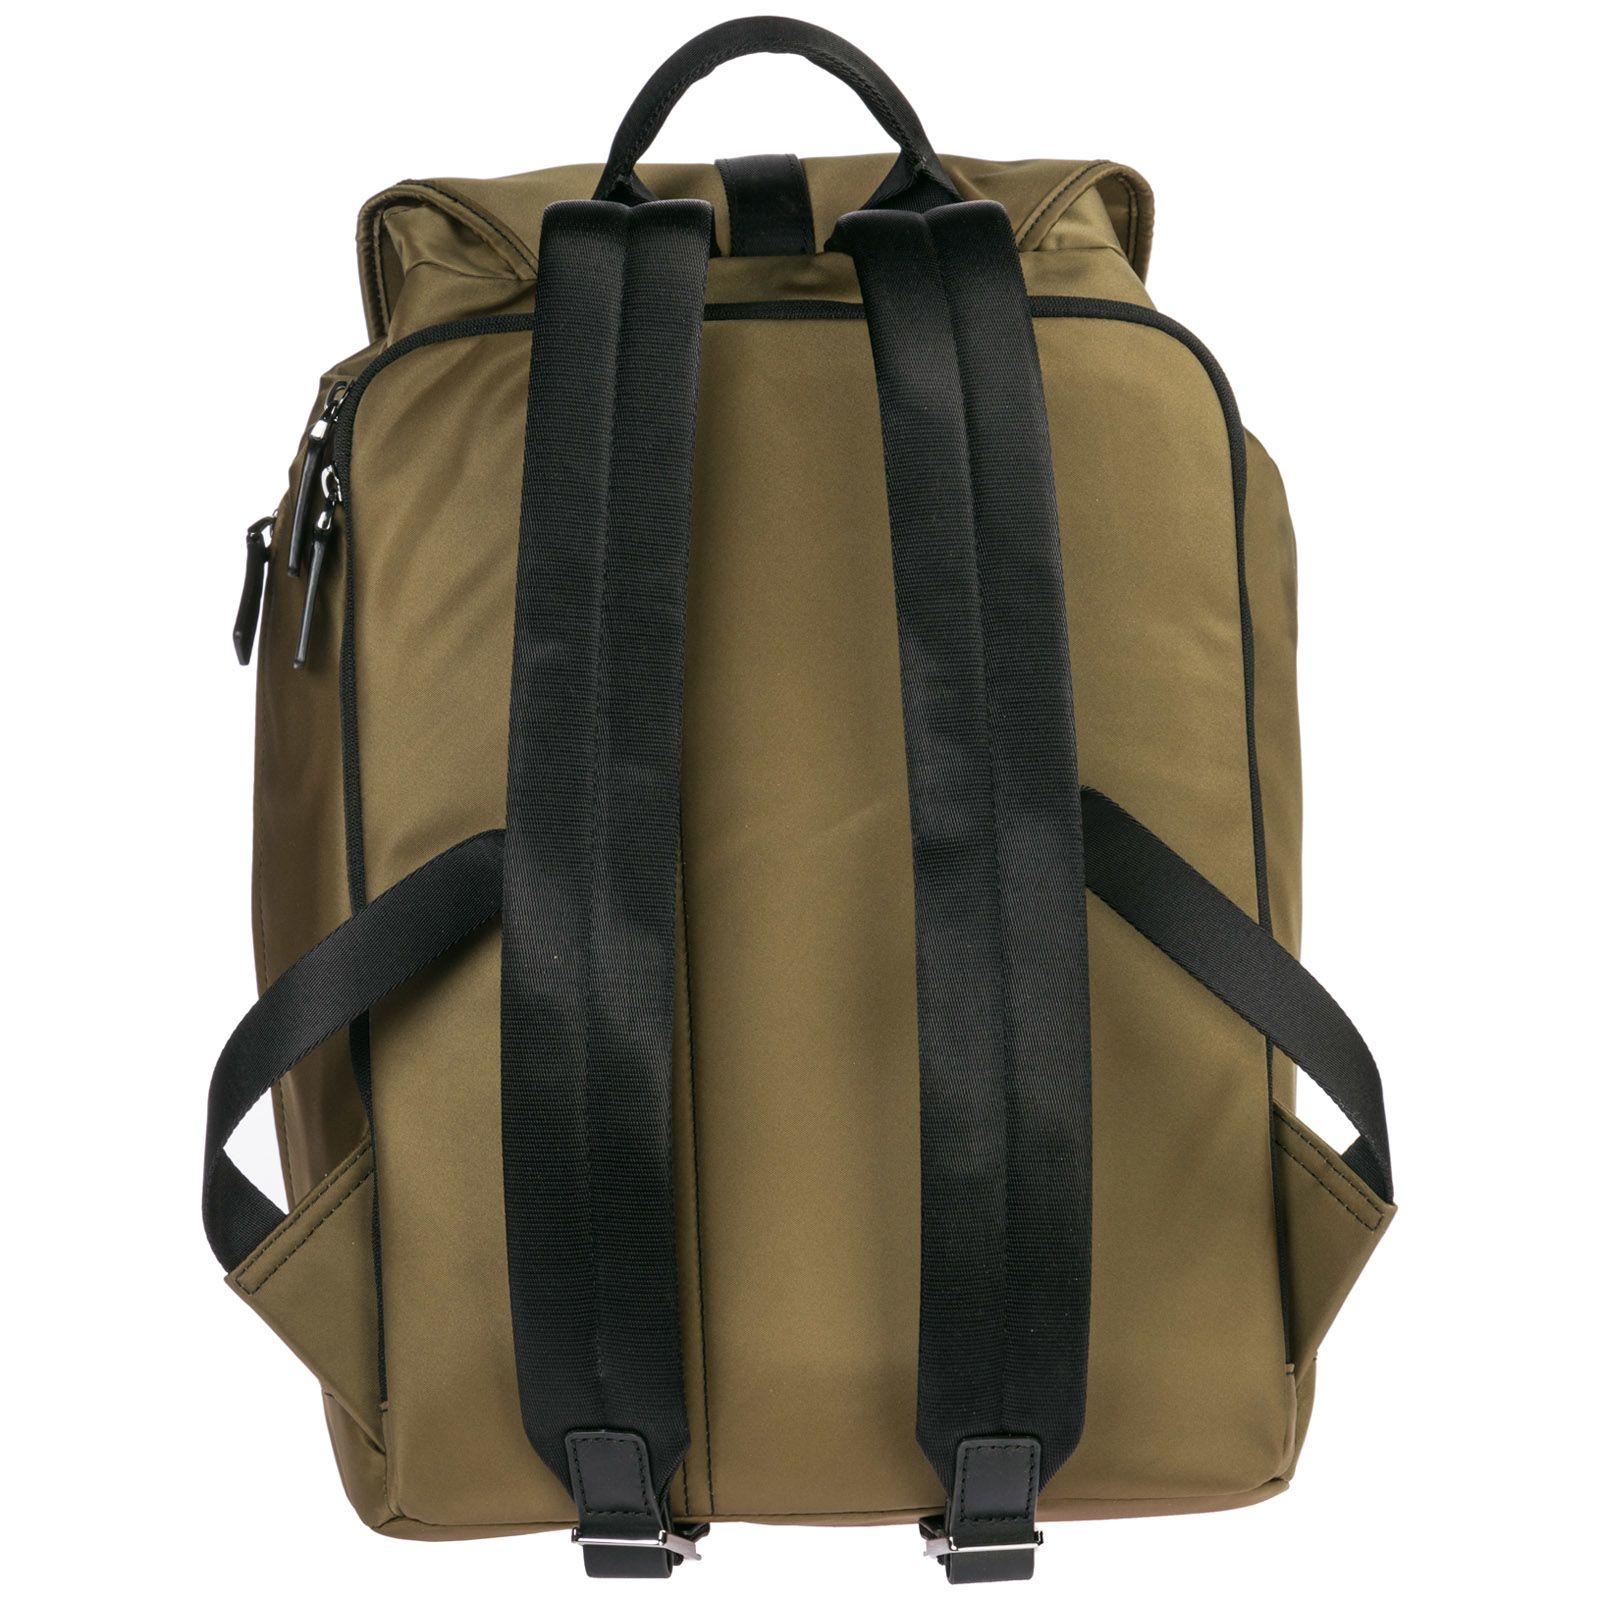 73b079e06a10 Michael Kors Michael Kors Nylon Rucksack Backpack Travel Kent ...